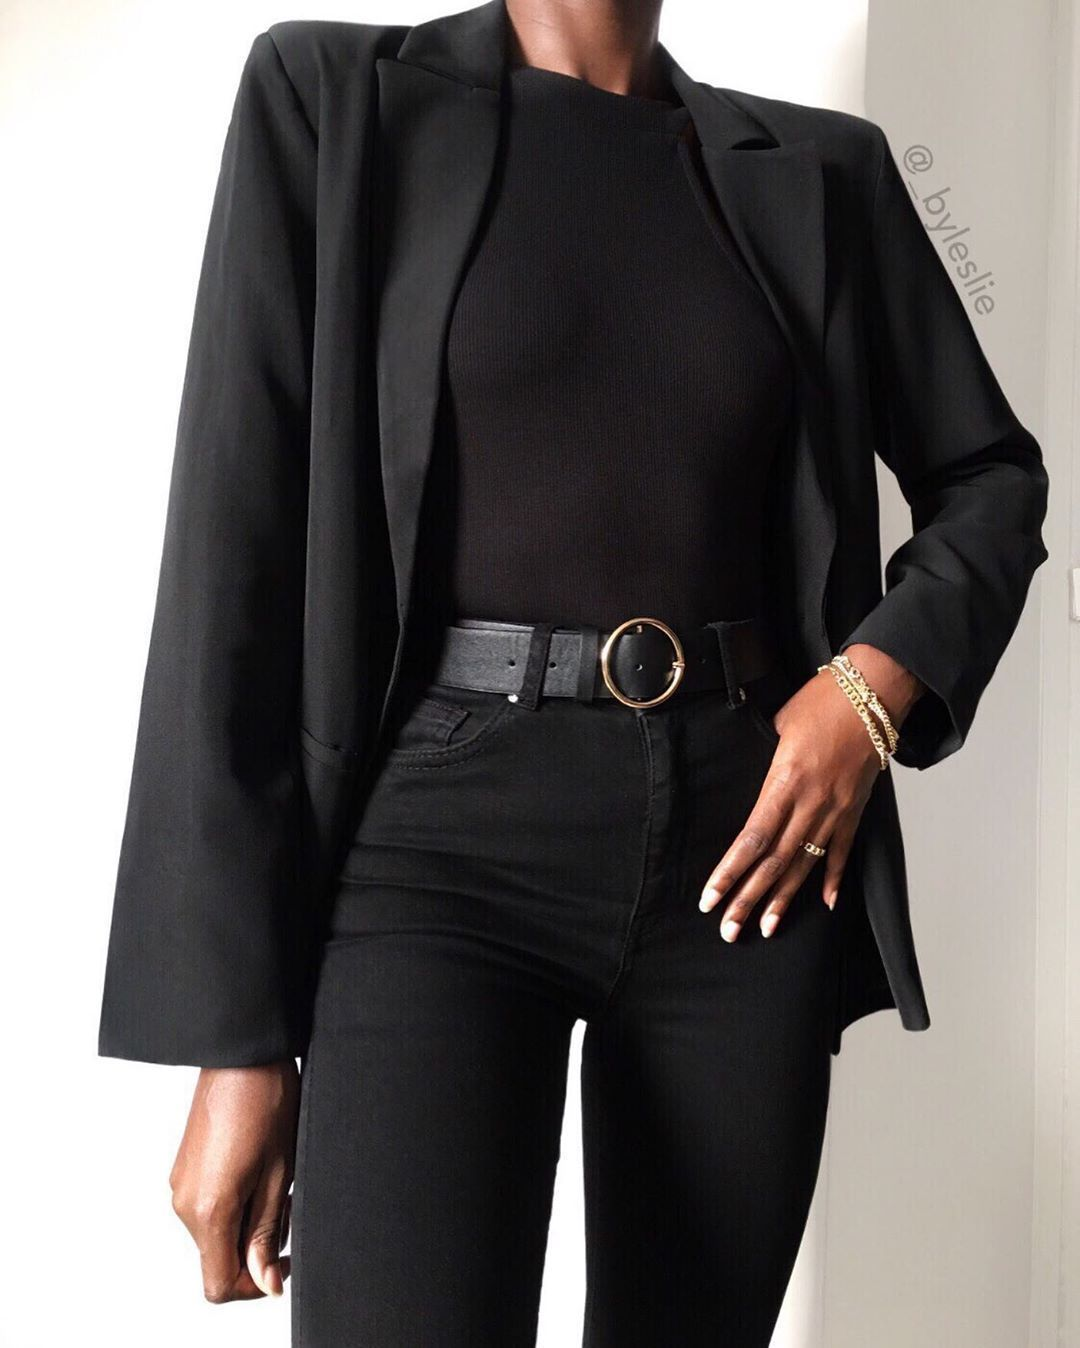 Abendmode & Party Mode für FrauenBlazer in schwarz Windsor Windsor Abendmode & ...